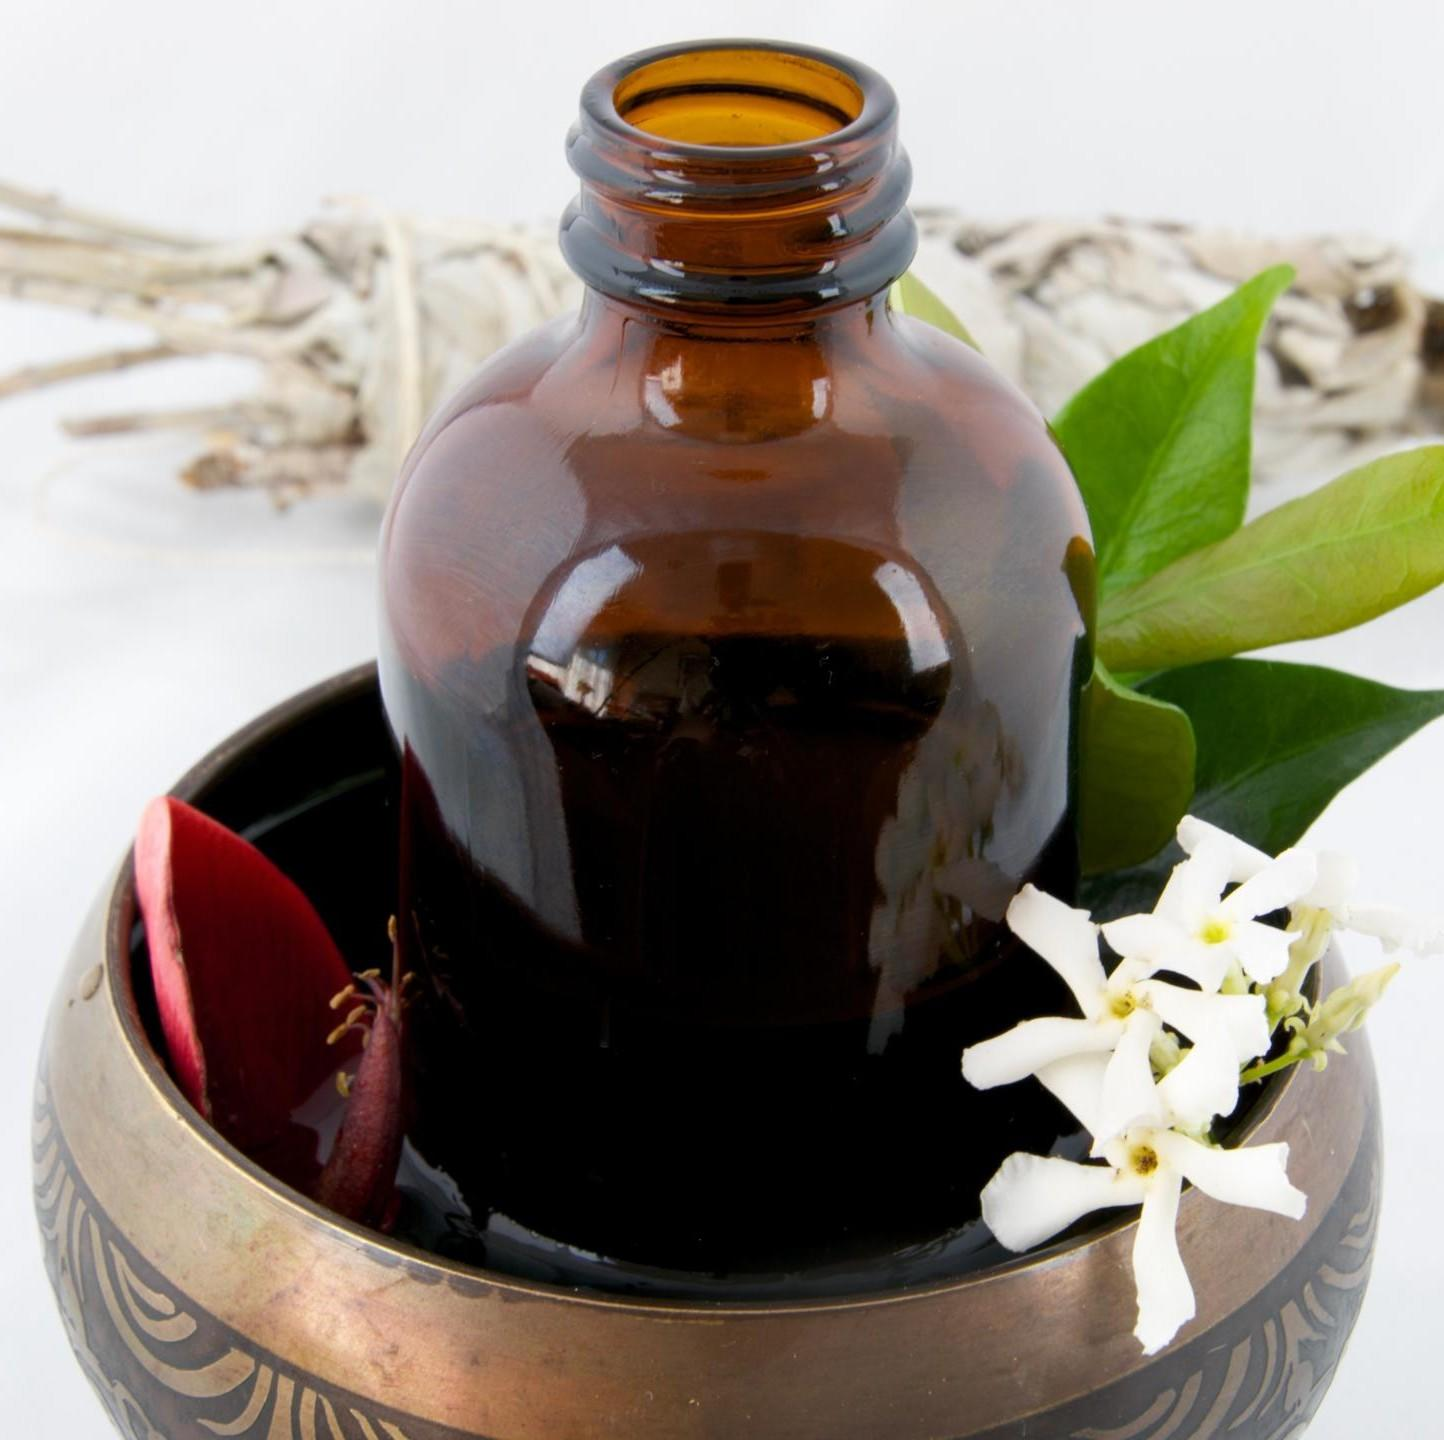 Herbal Teas & Oils